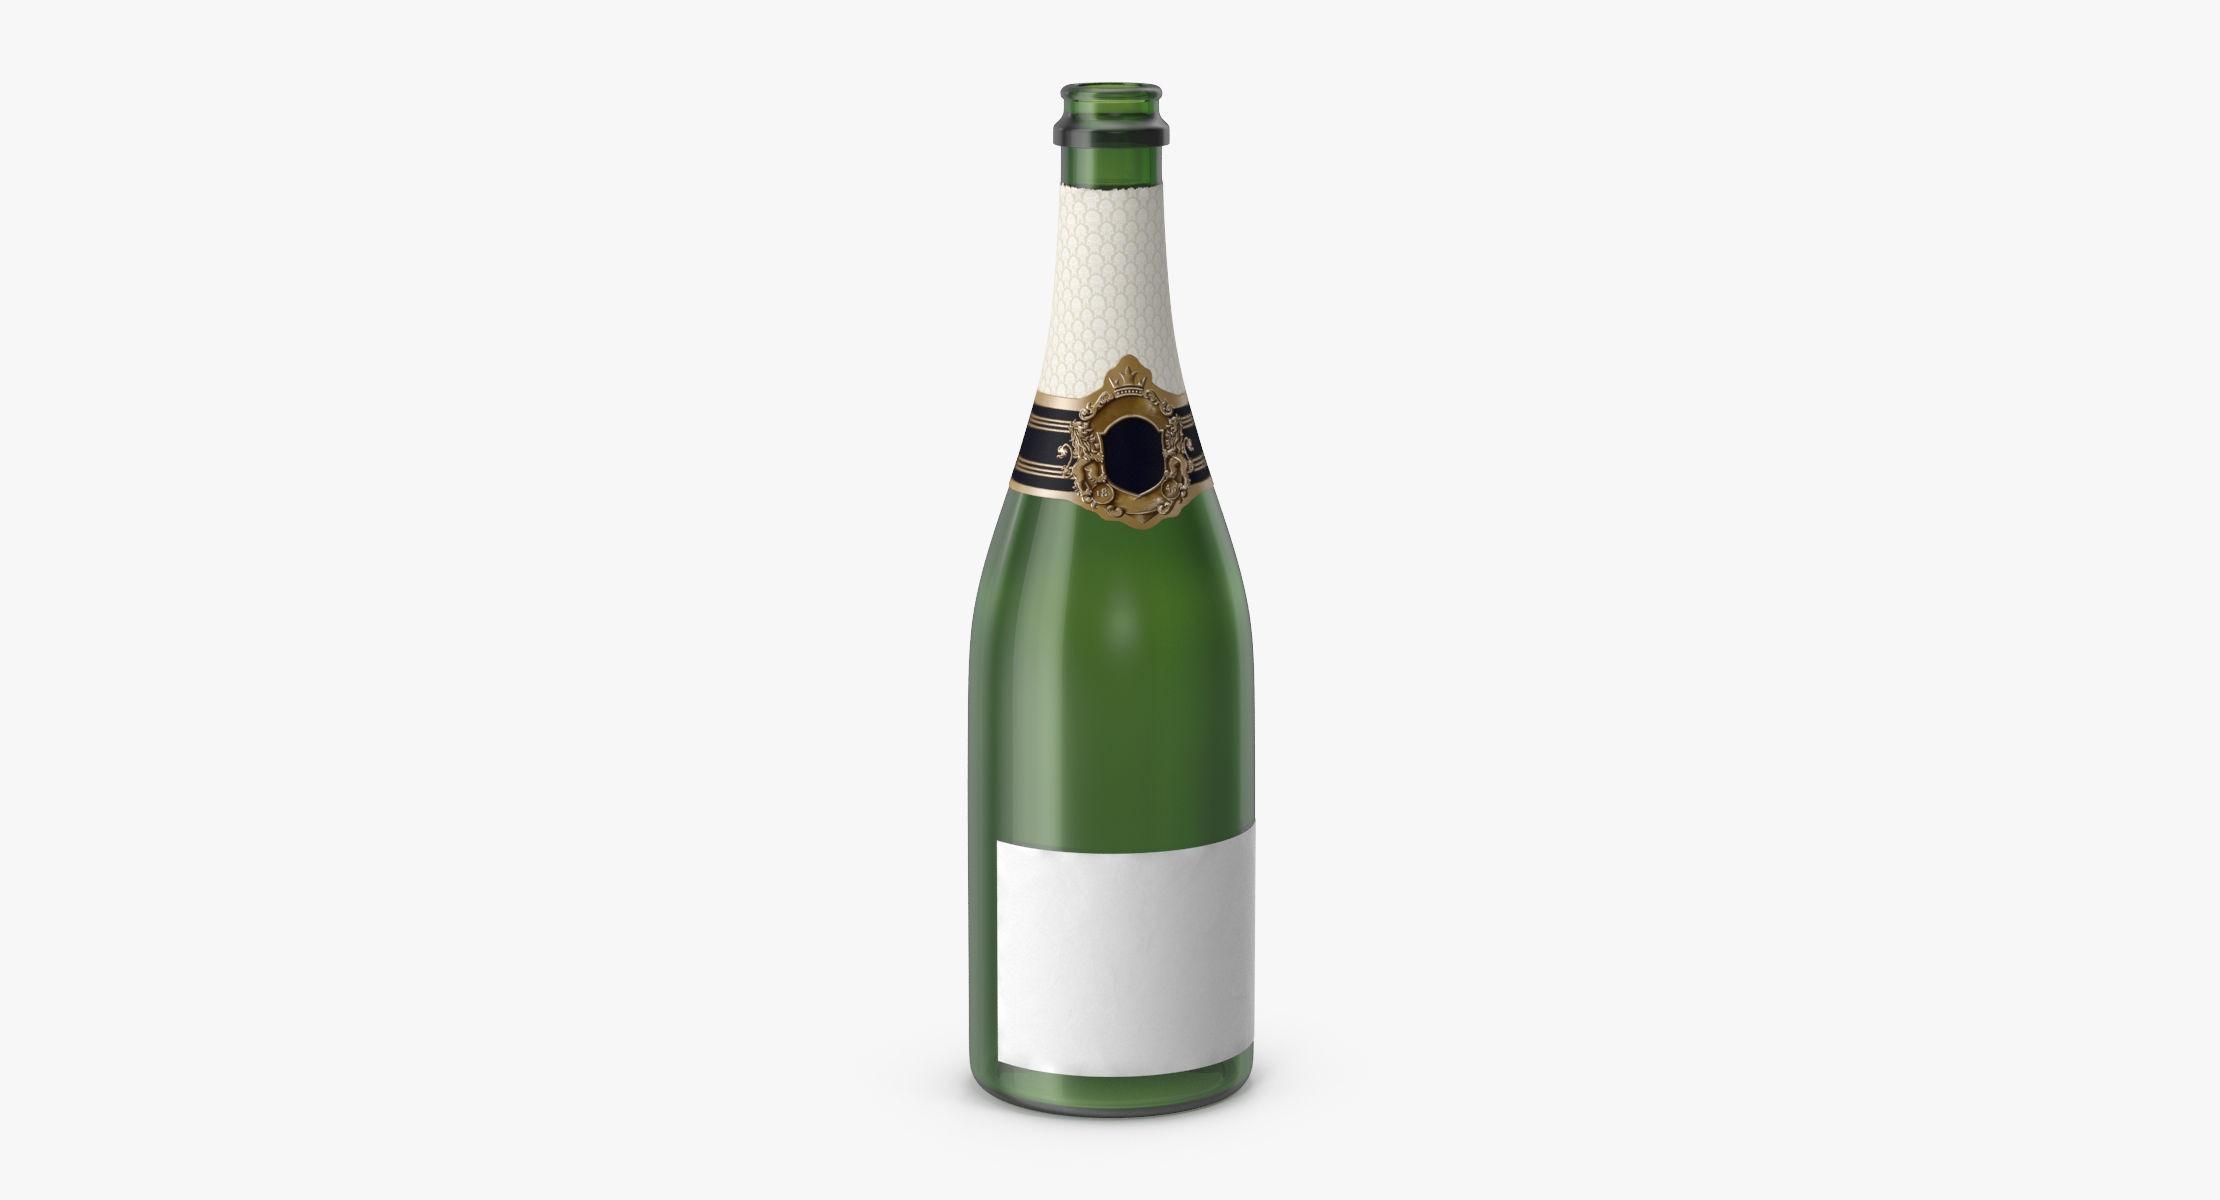 Champagne Bottle 01 Opened - reel 1